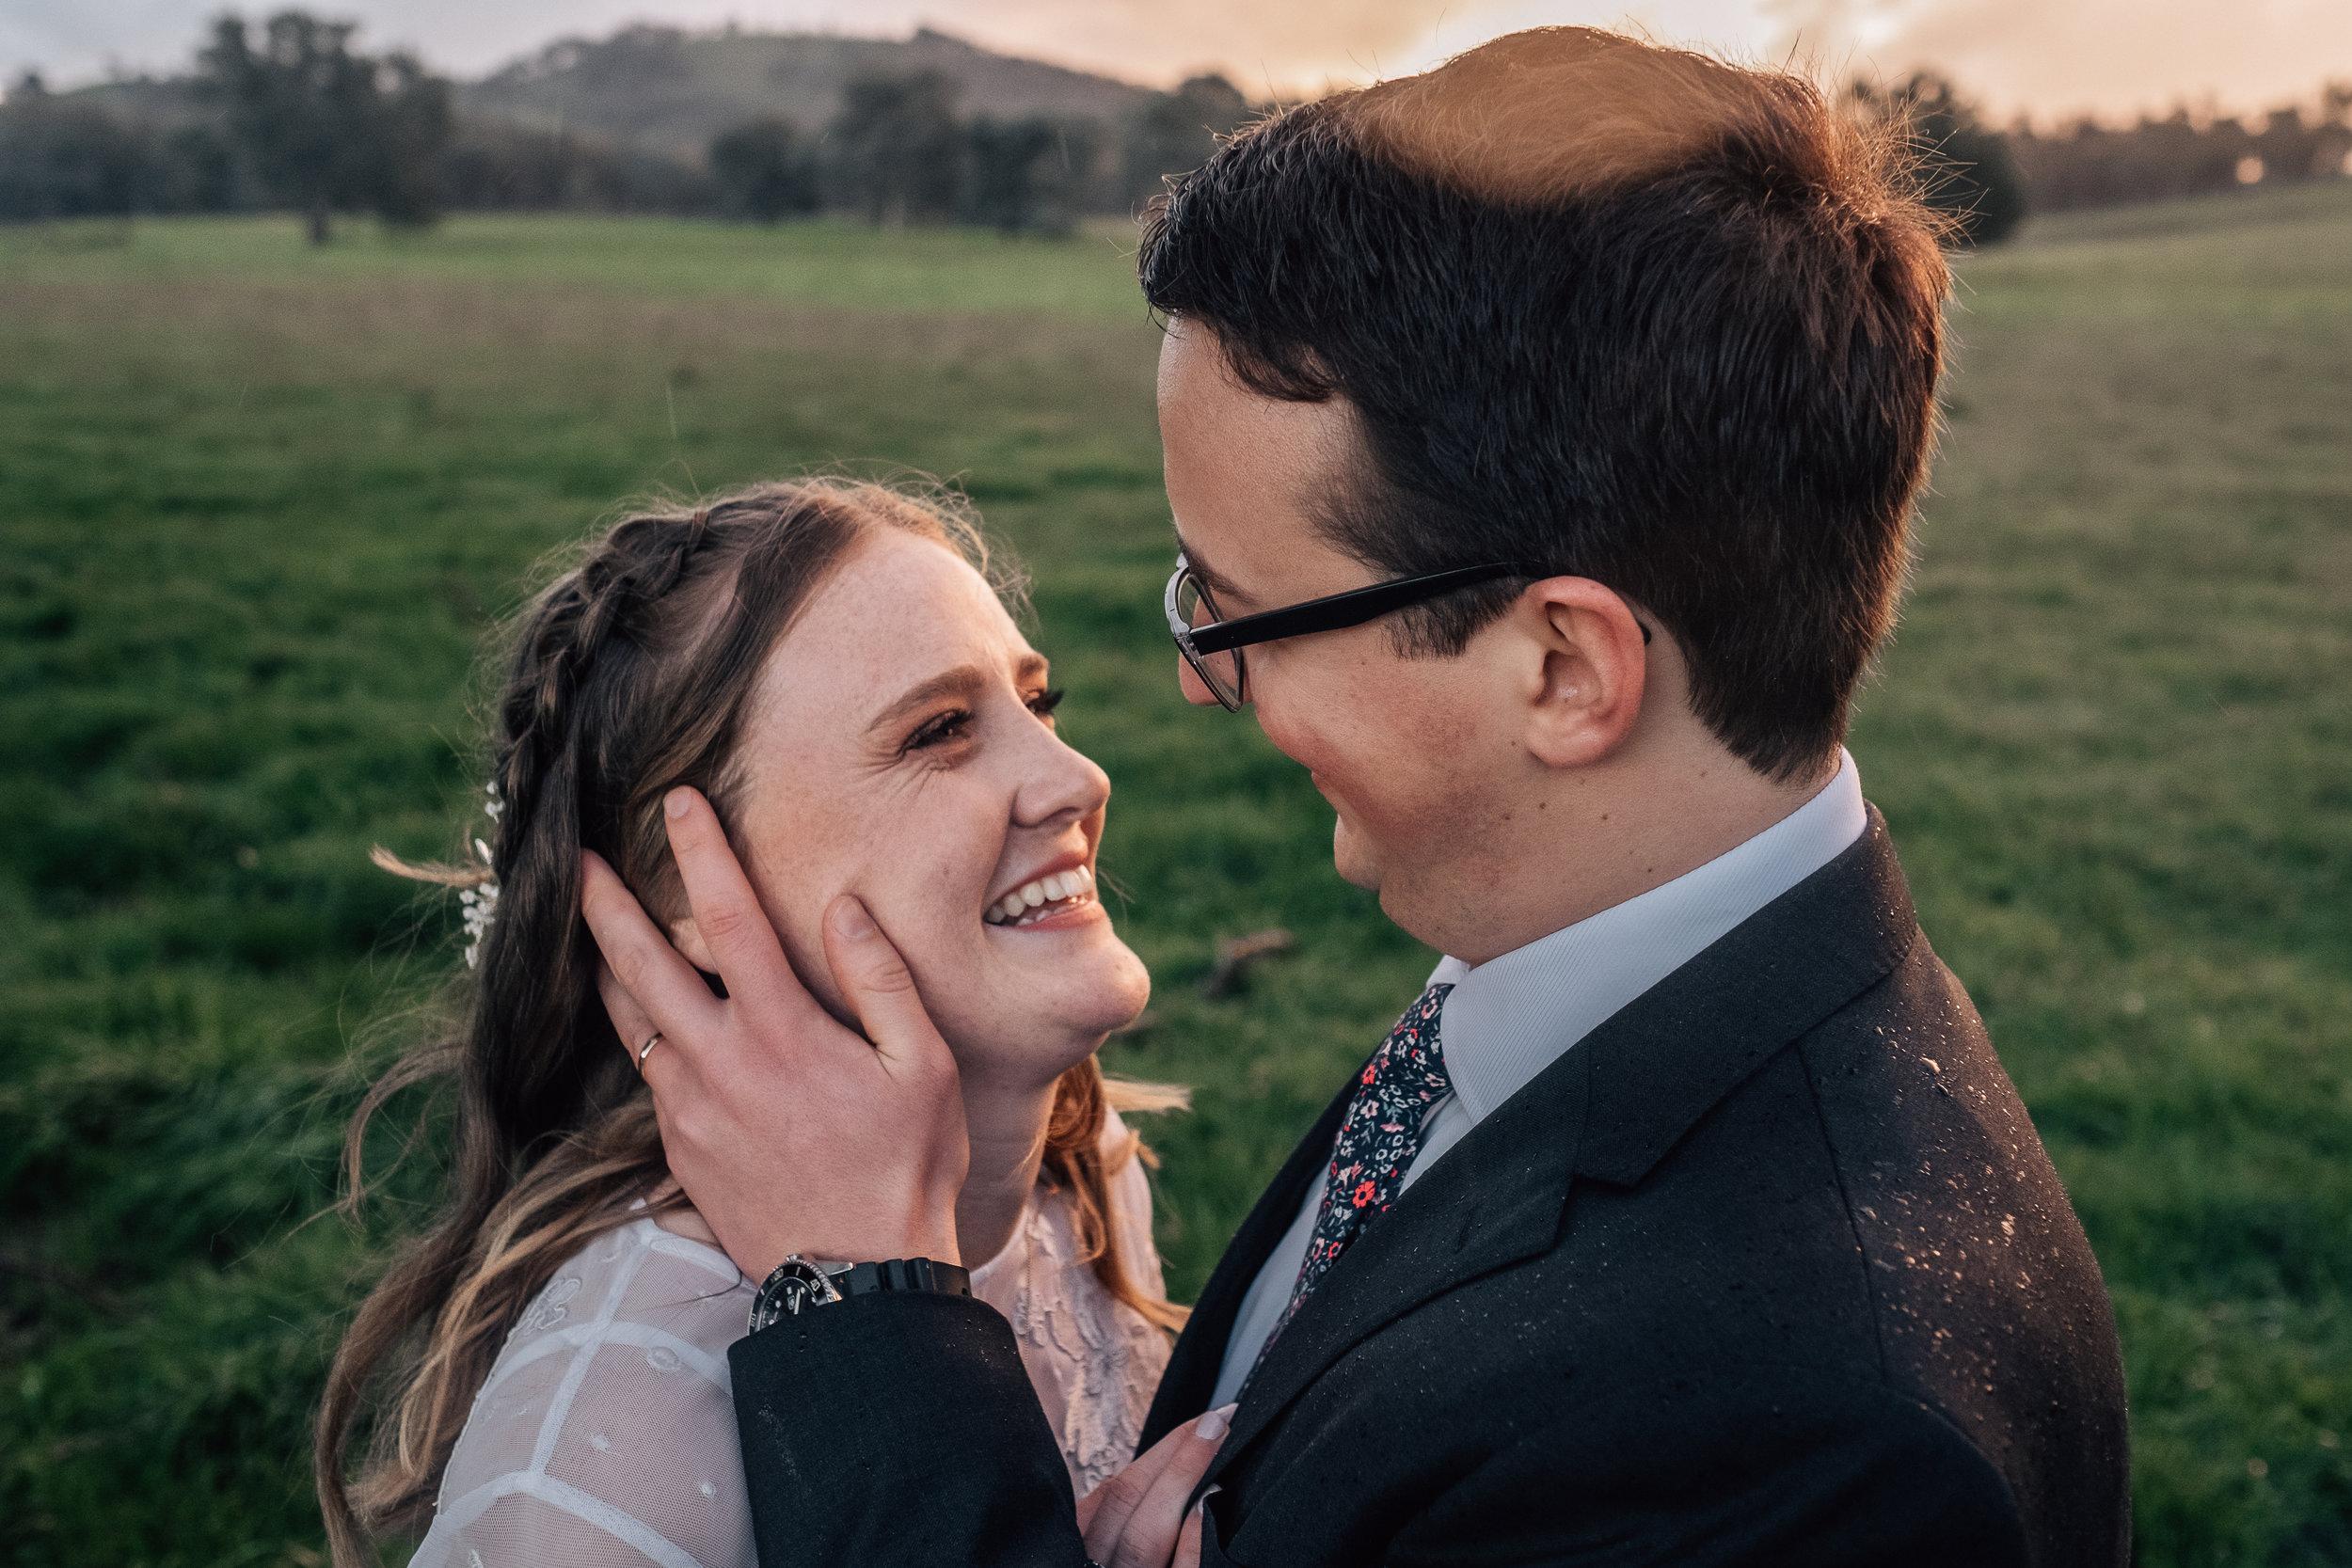 mornington peninsula bride and wedding day